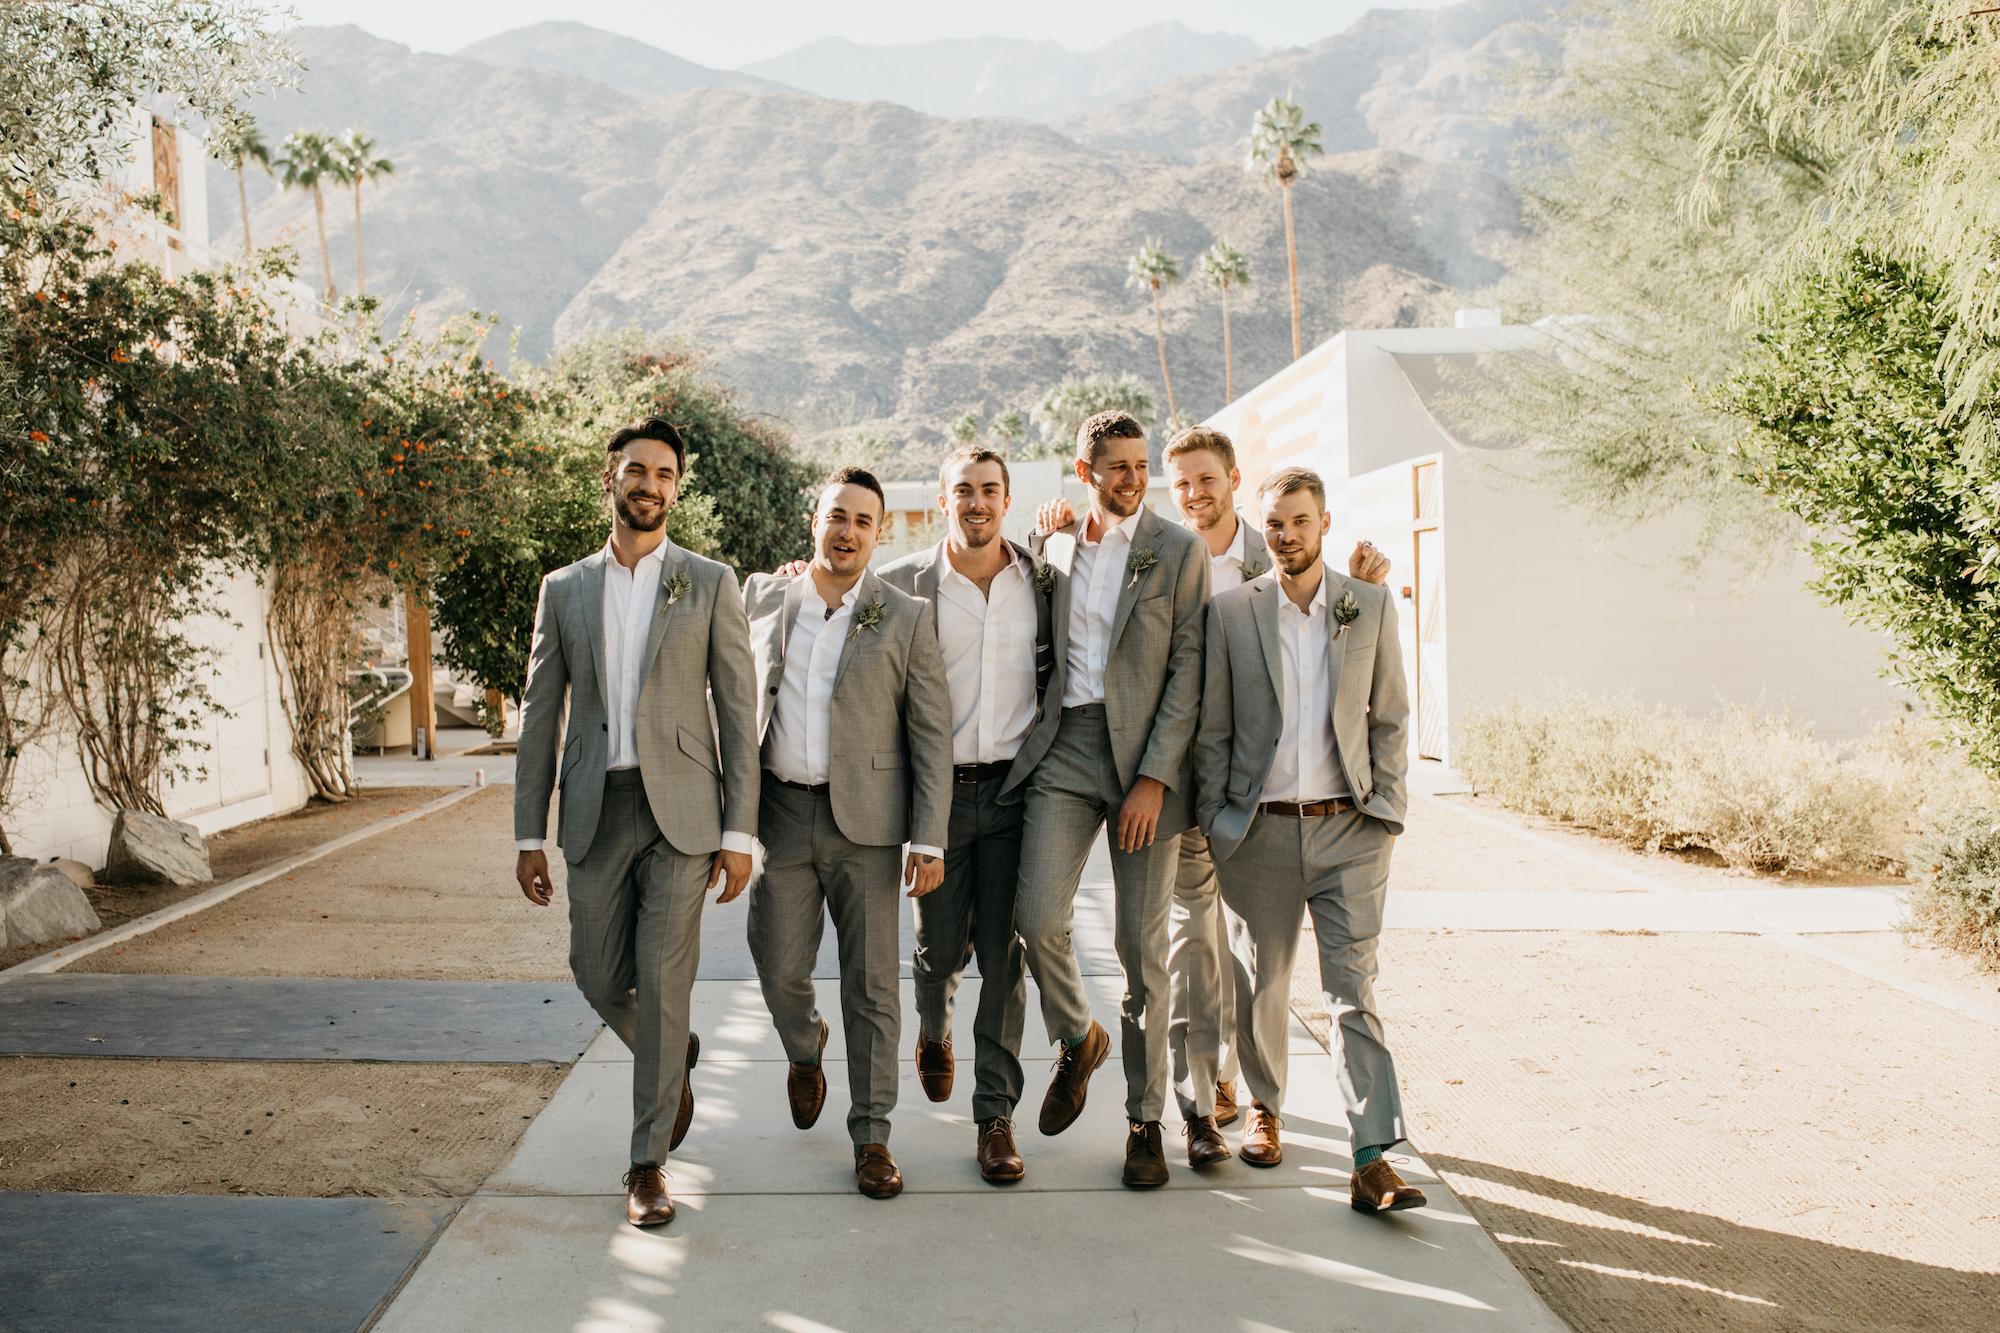 ace-hotel-palm-springs-wedding-photographer400.jpg